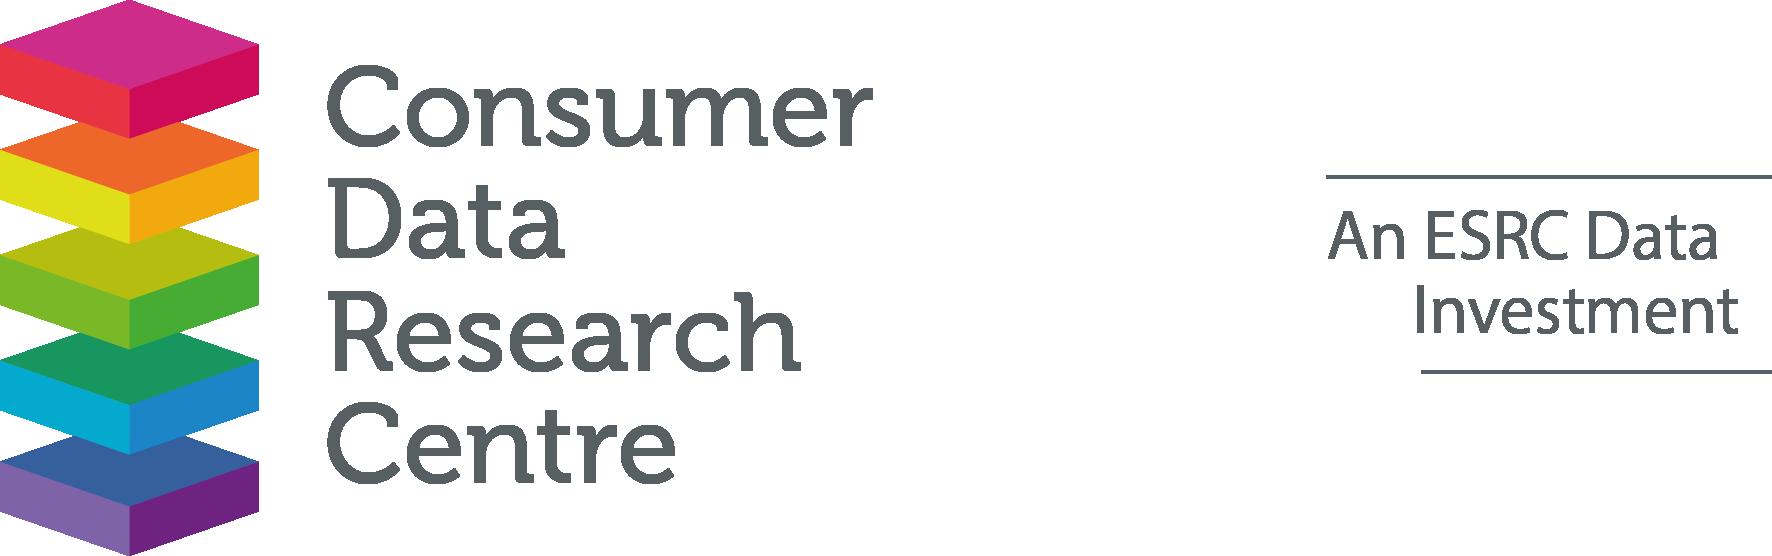 Consumer Data Research Centre